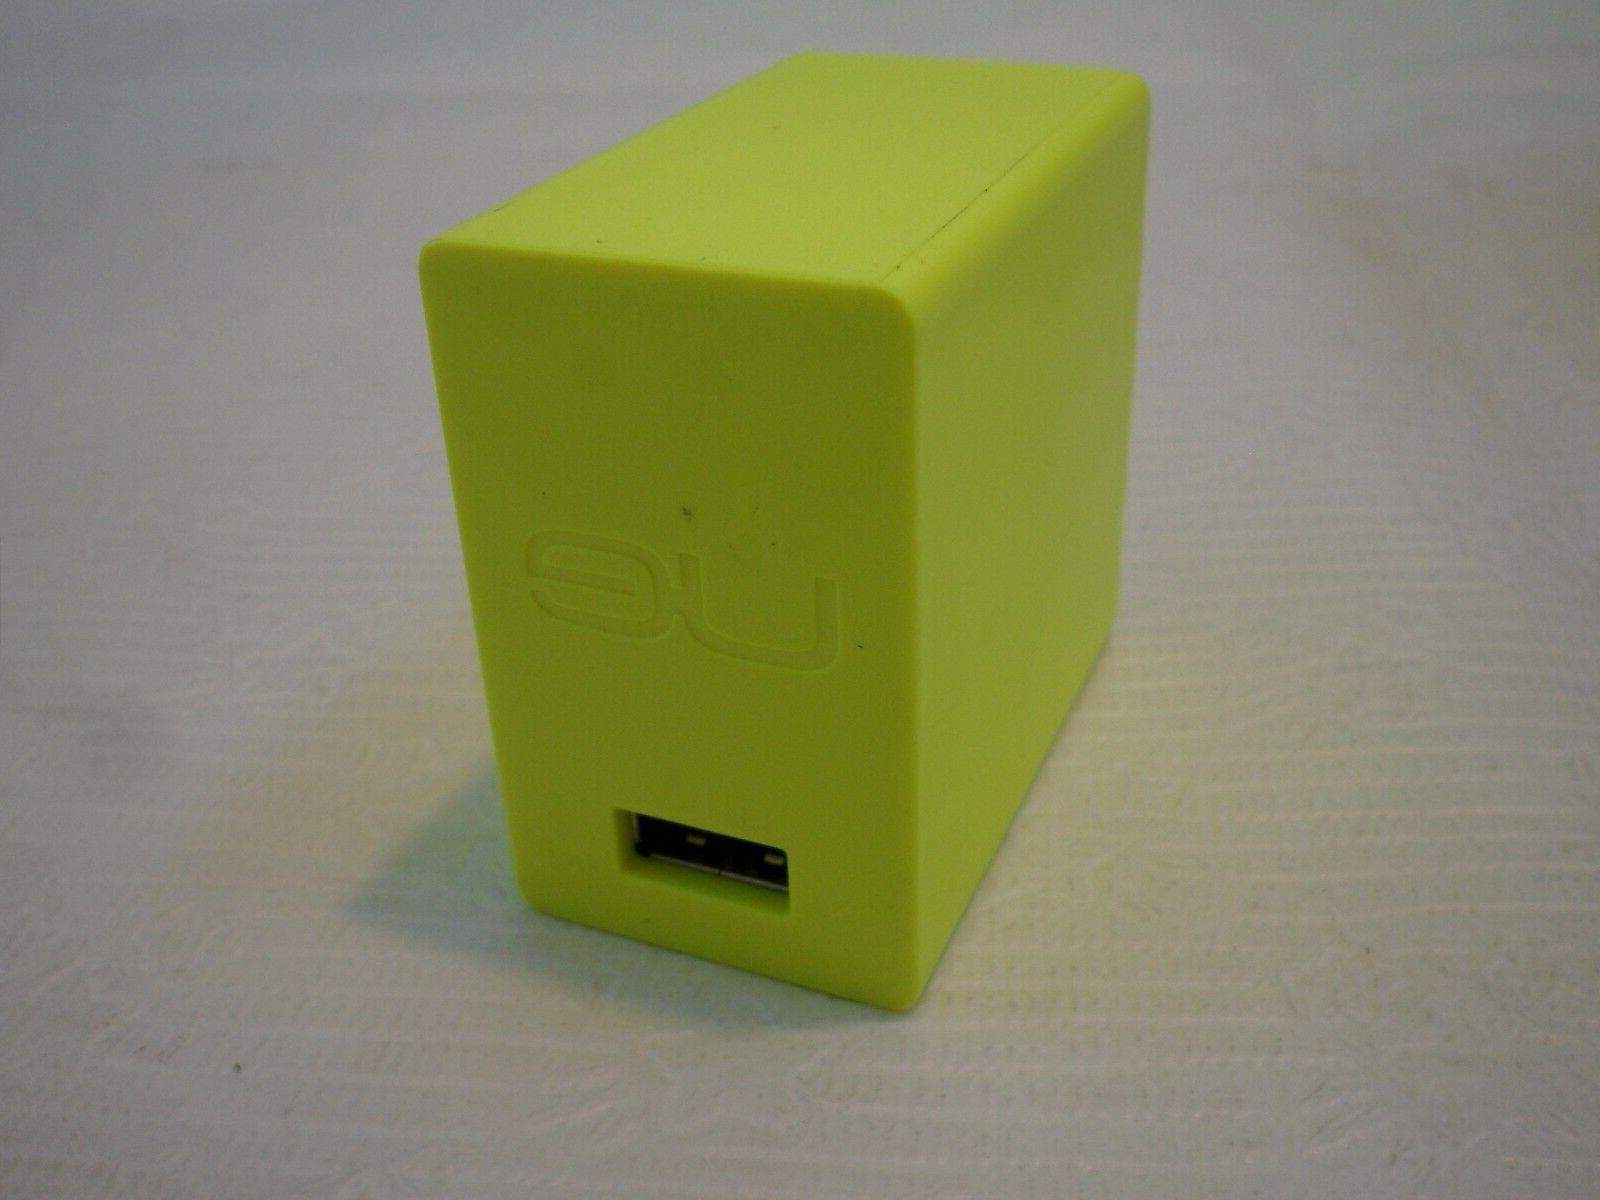 LOGITECH Megaboom Adapter 2A USB Charger